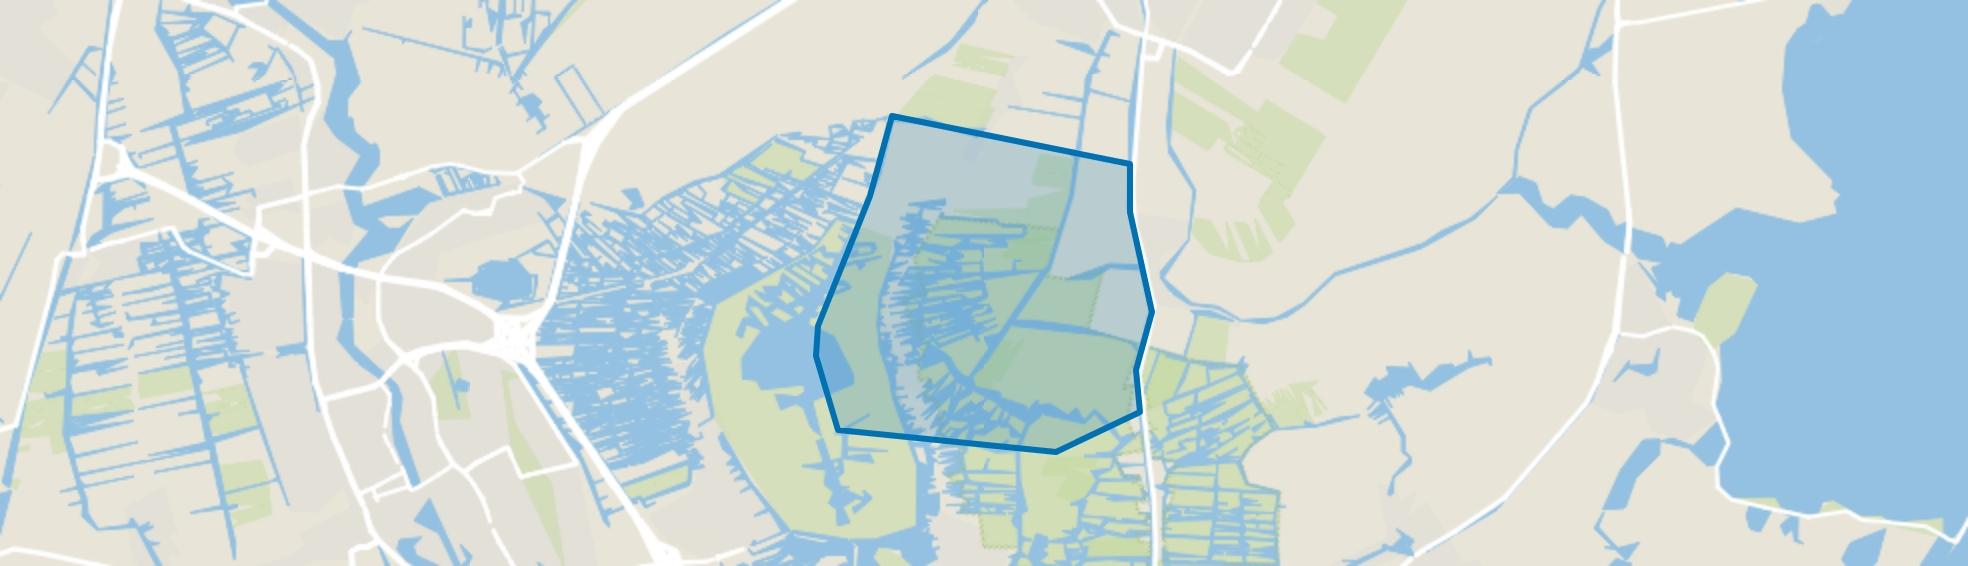 Den Ilp, Landsmeer map